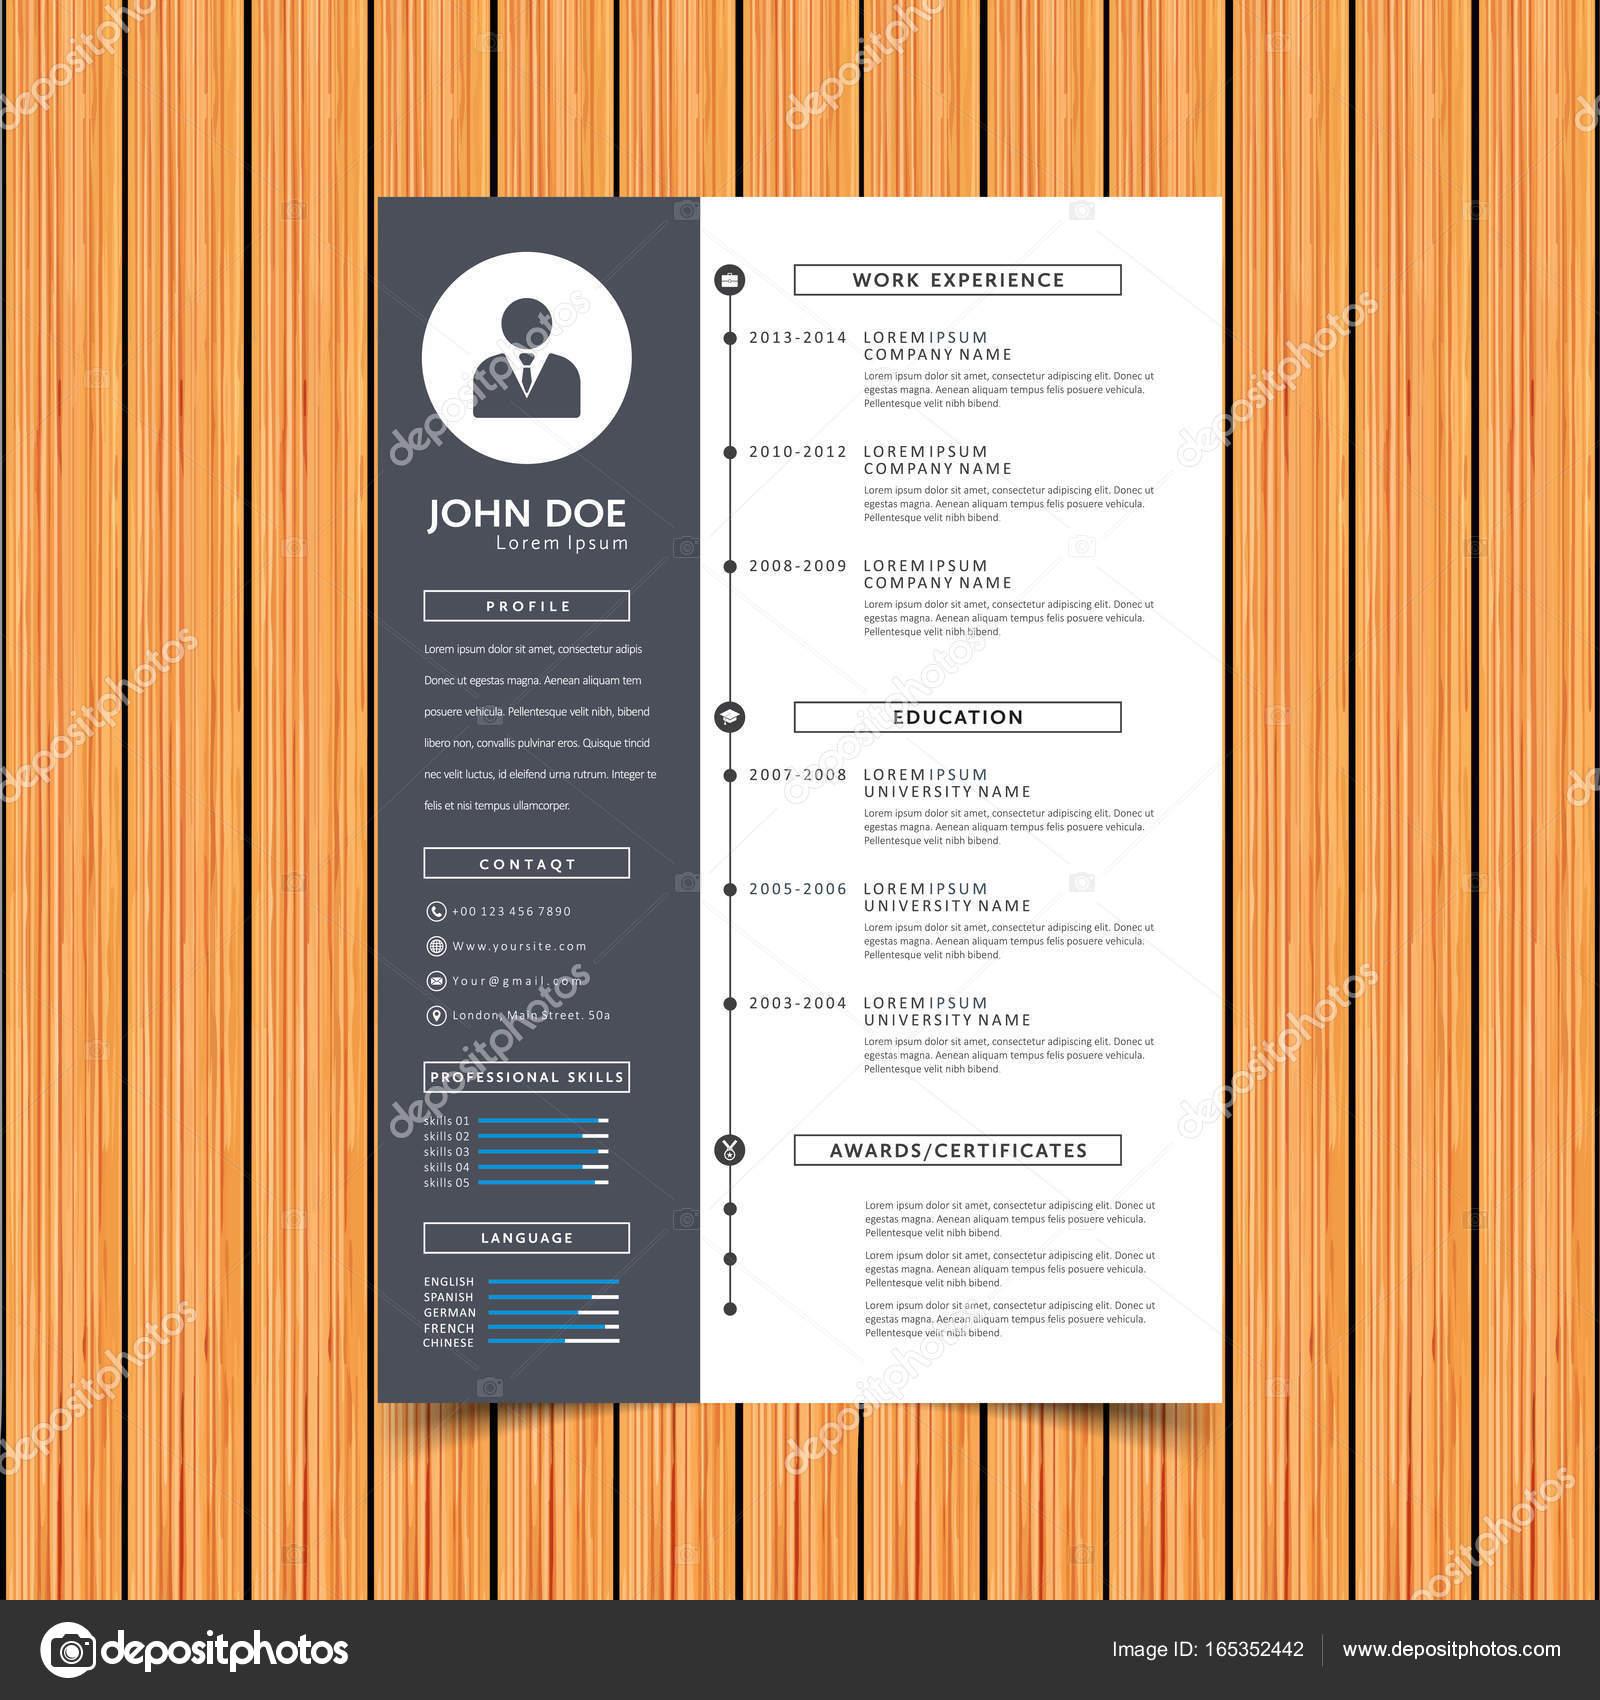 print-Designvorlage Lebenslauf — Stockvektor © Xologon #165352442